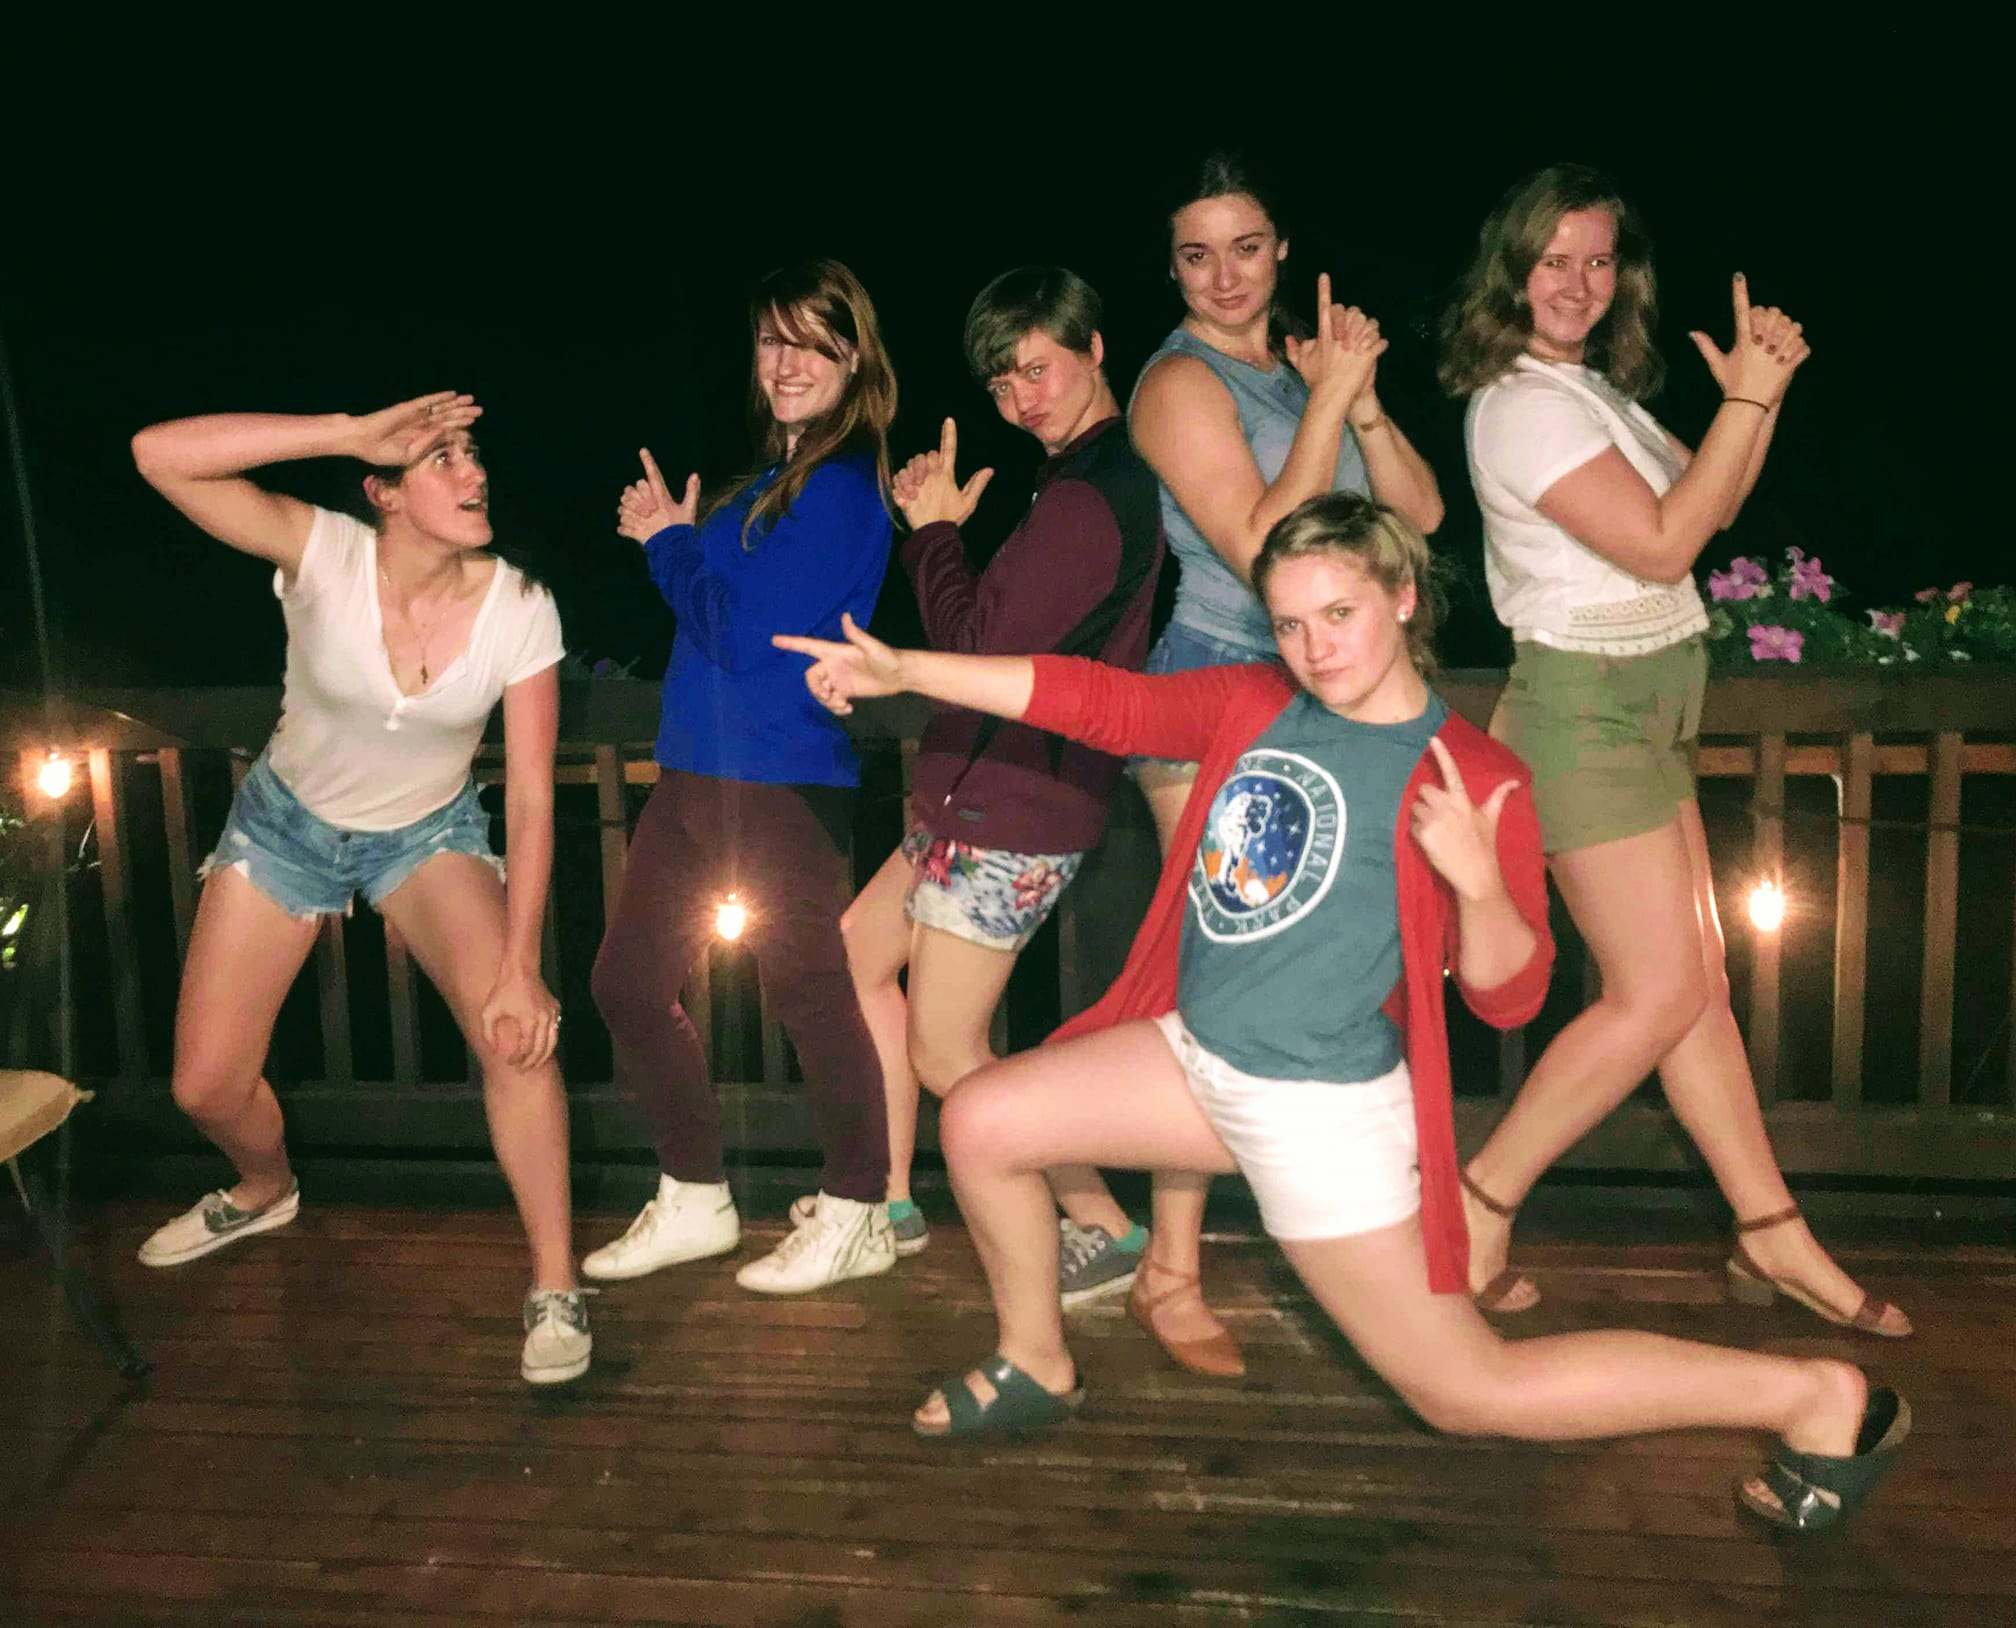 Brookie bonfire with Christine (BOF'17), Christine (BOF'17), Piper (BOF'17), Shannon (BOF'18), Esther (BOF'18) and me (BOF'18)